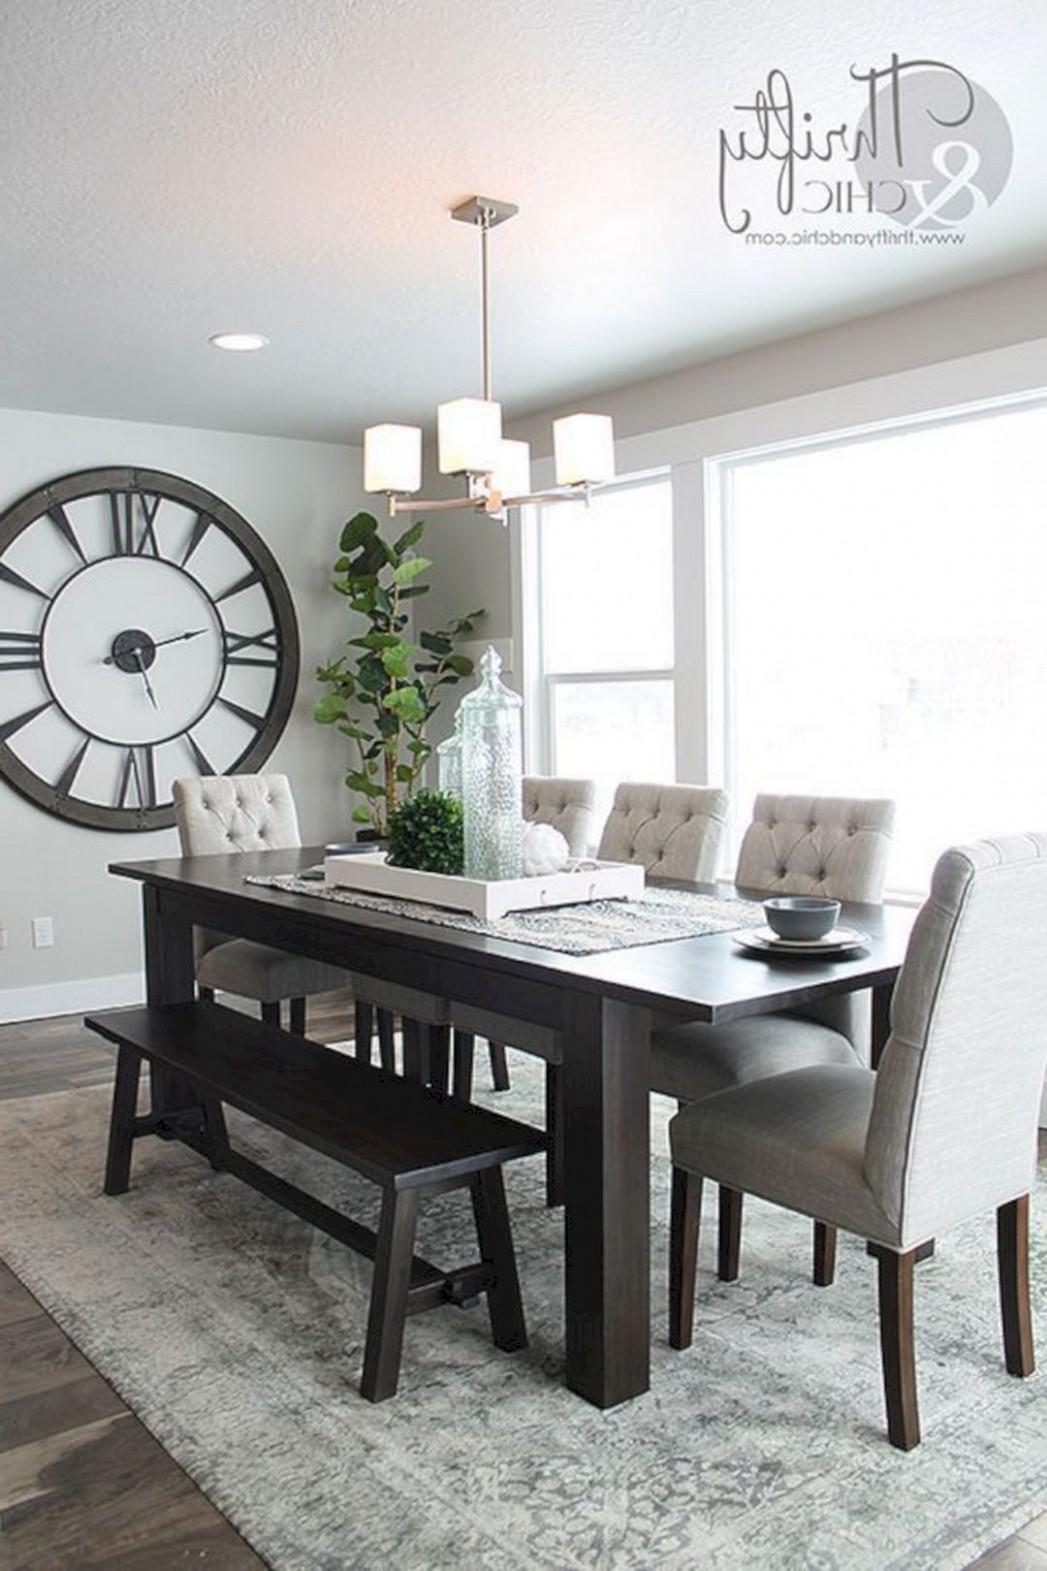 Great Idea 10 Simple and Minimalist Dining Table Decor Ideas http  - Dining Room Ideas Tables